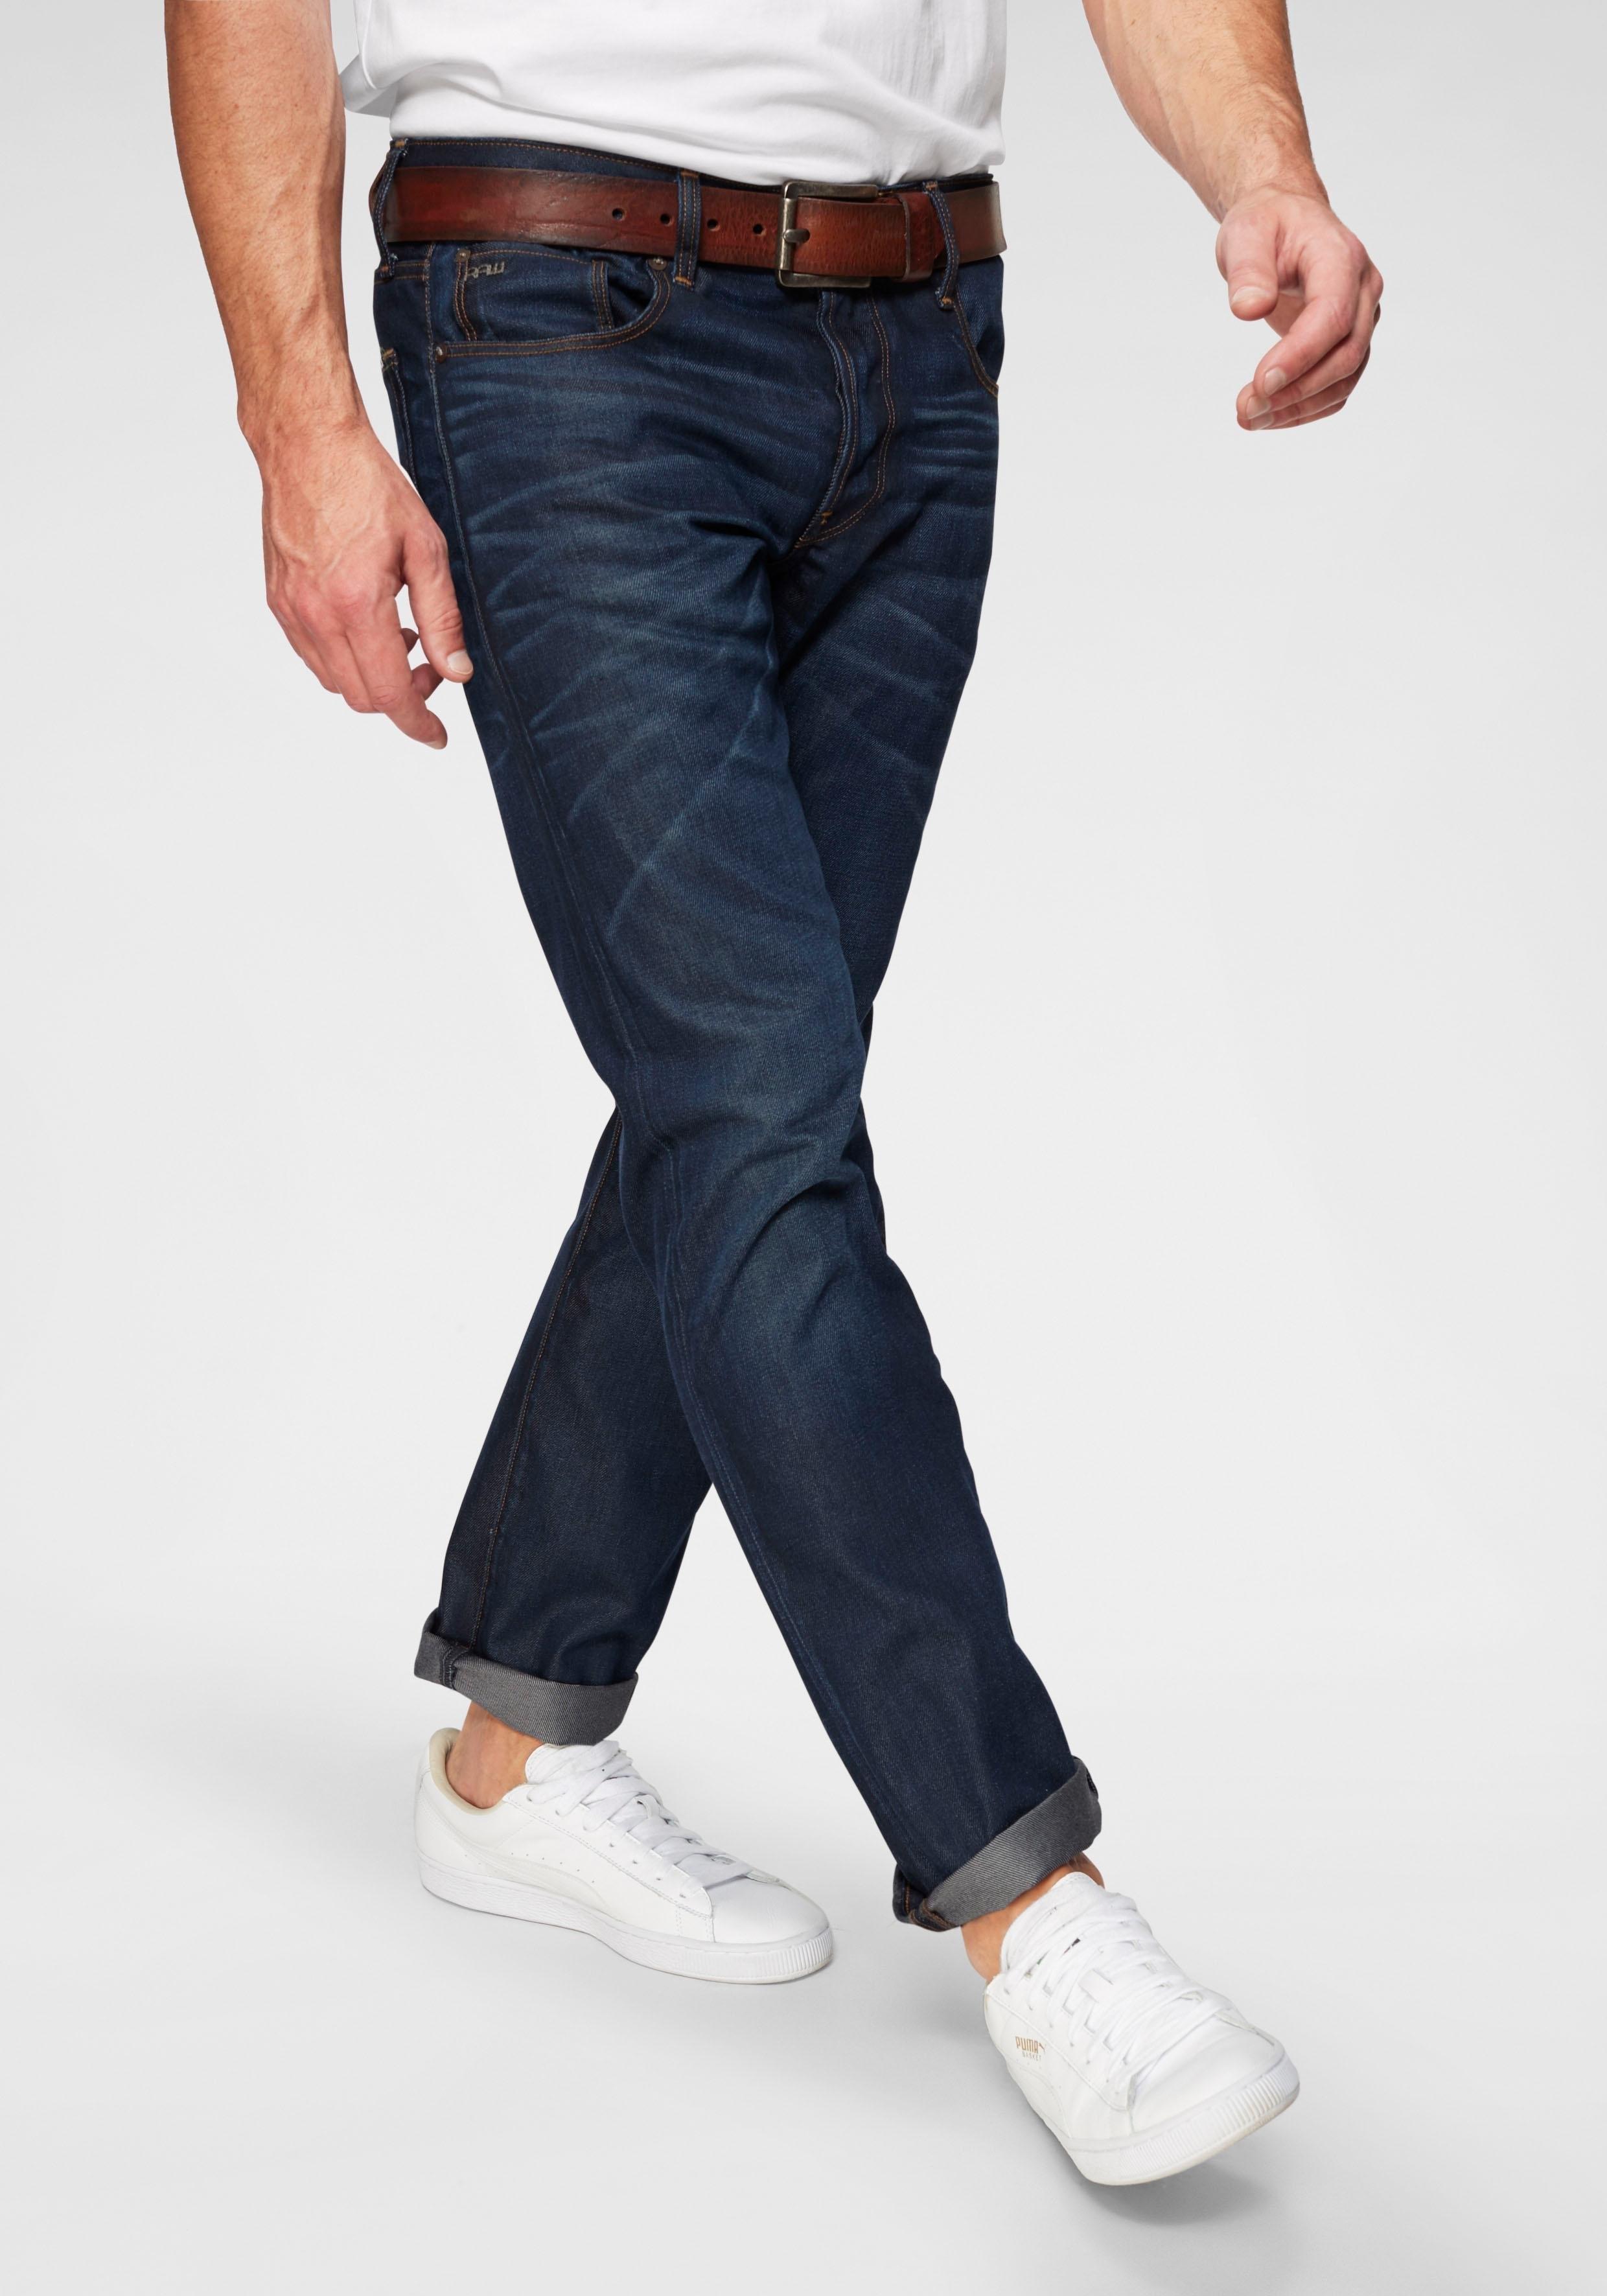 G-Star RAW straight jeans bestellen: 30 dagen bedenktijd